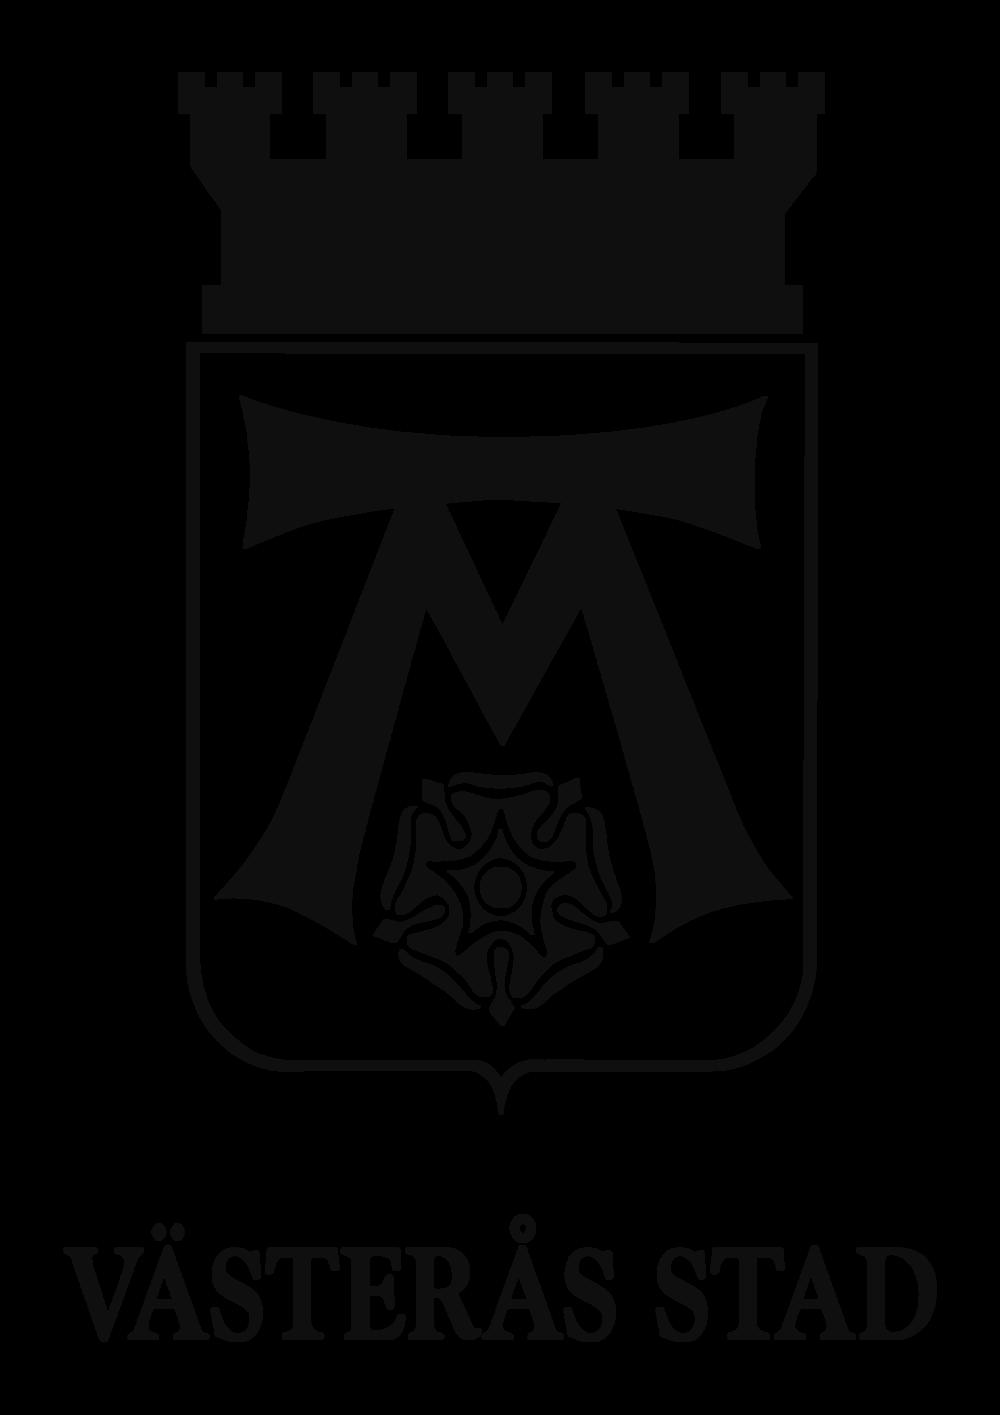 västerås stad logo copy.png